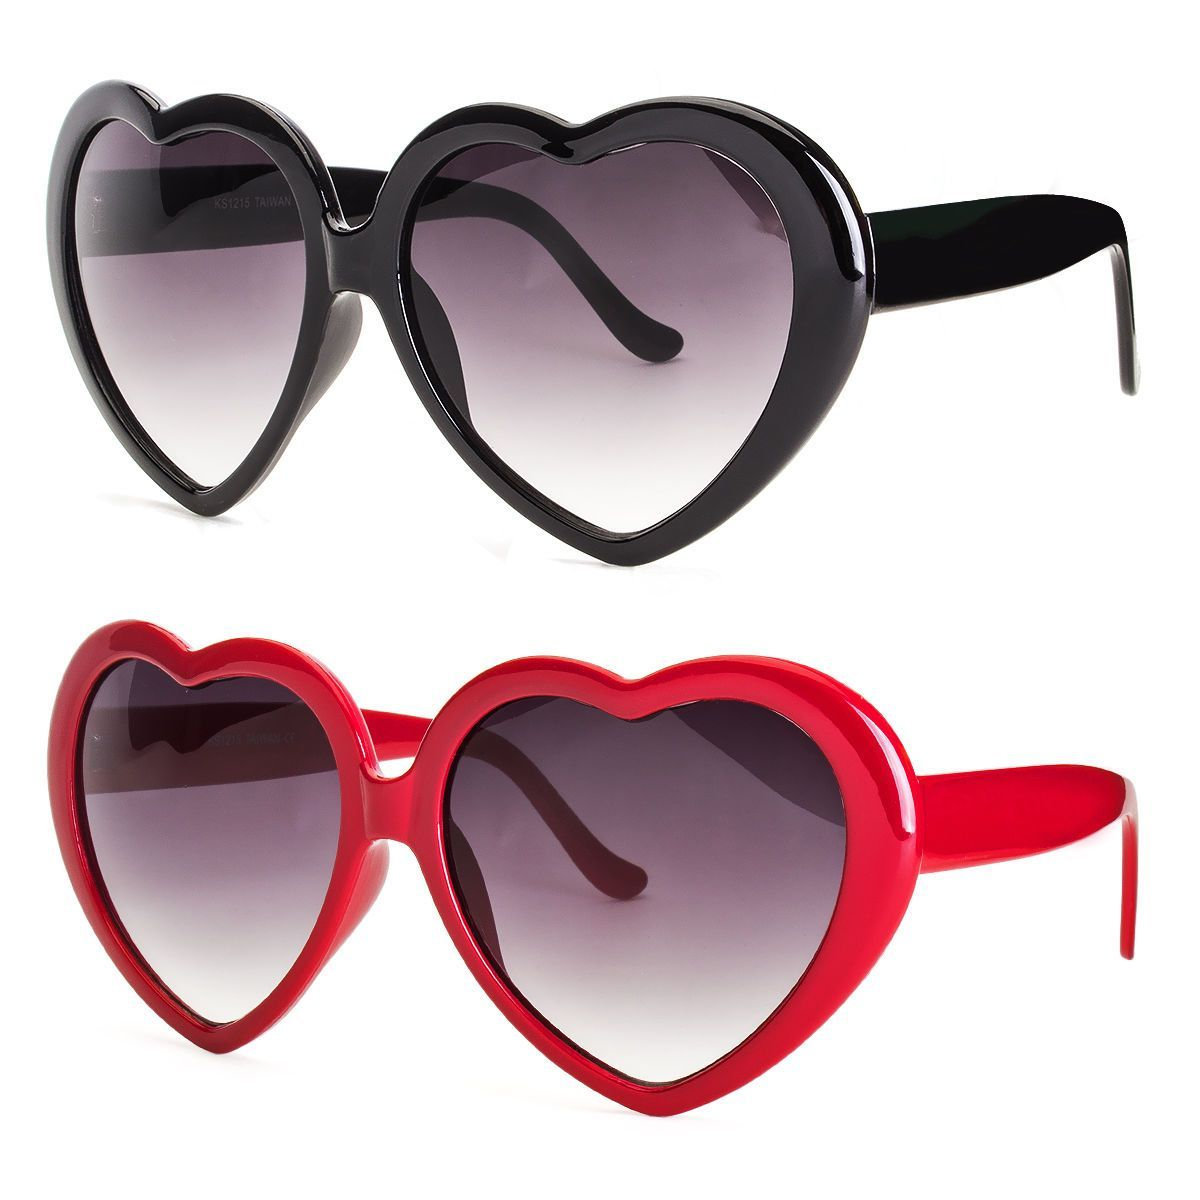 4dbb39883c Vintage Retro Fashion Lolita Heart Shaped Pilot Black Frame Women Sunglasses  X